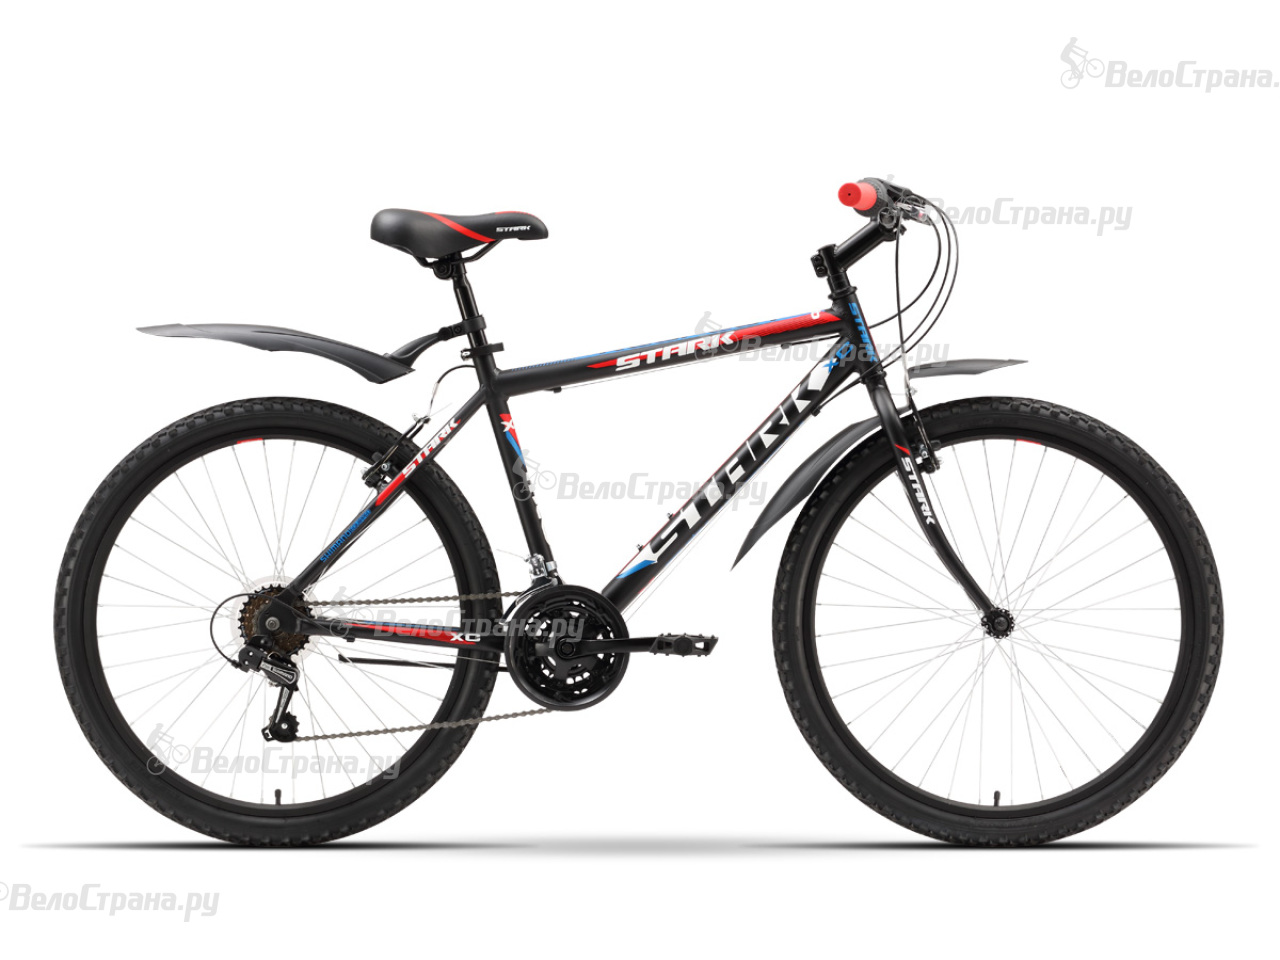 цена Велосипед Stark Respect (2016) онлайн в 2017 году